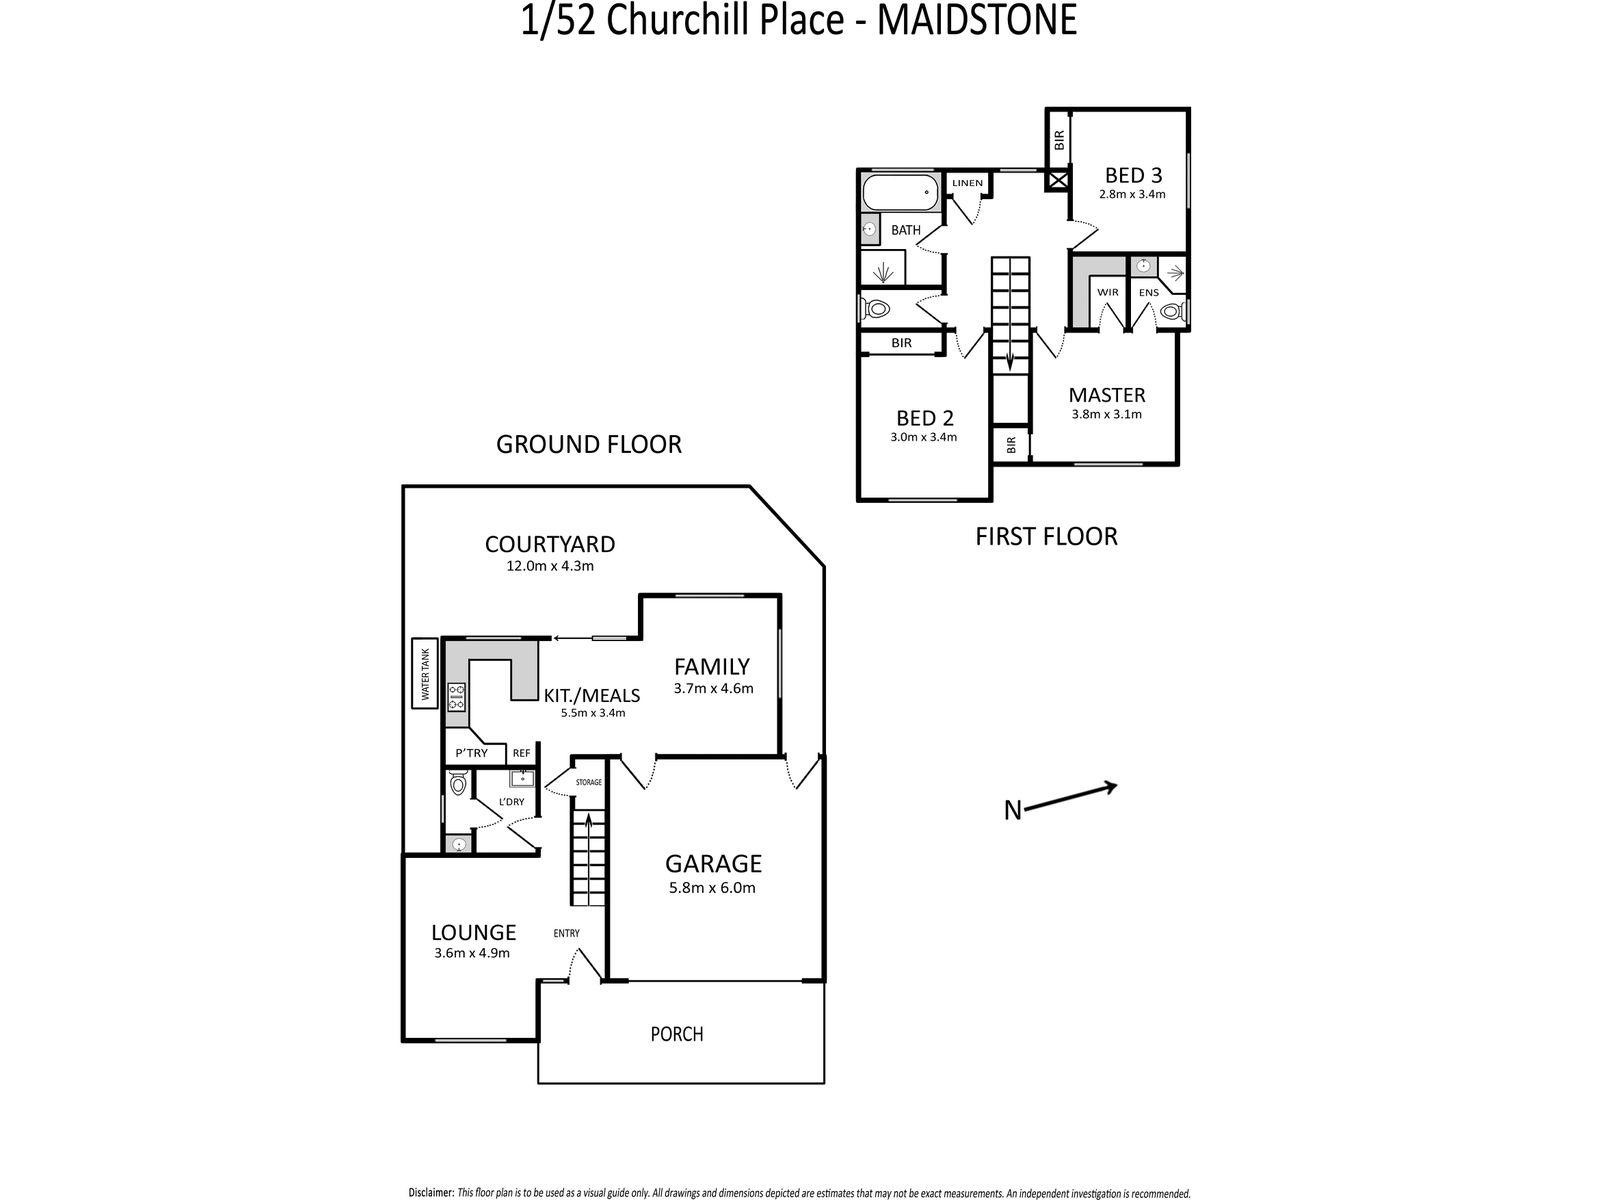 1 / 52 Churchill Place, Maidstone